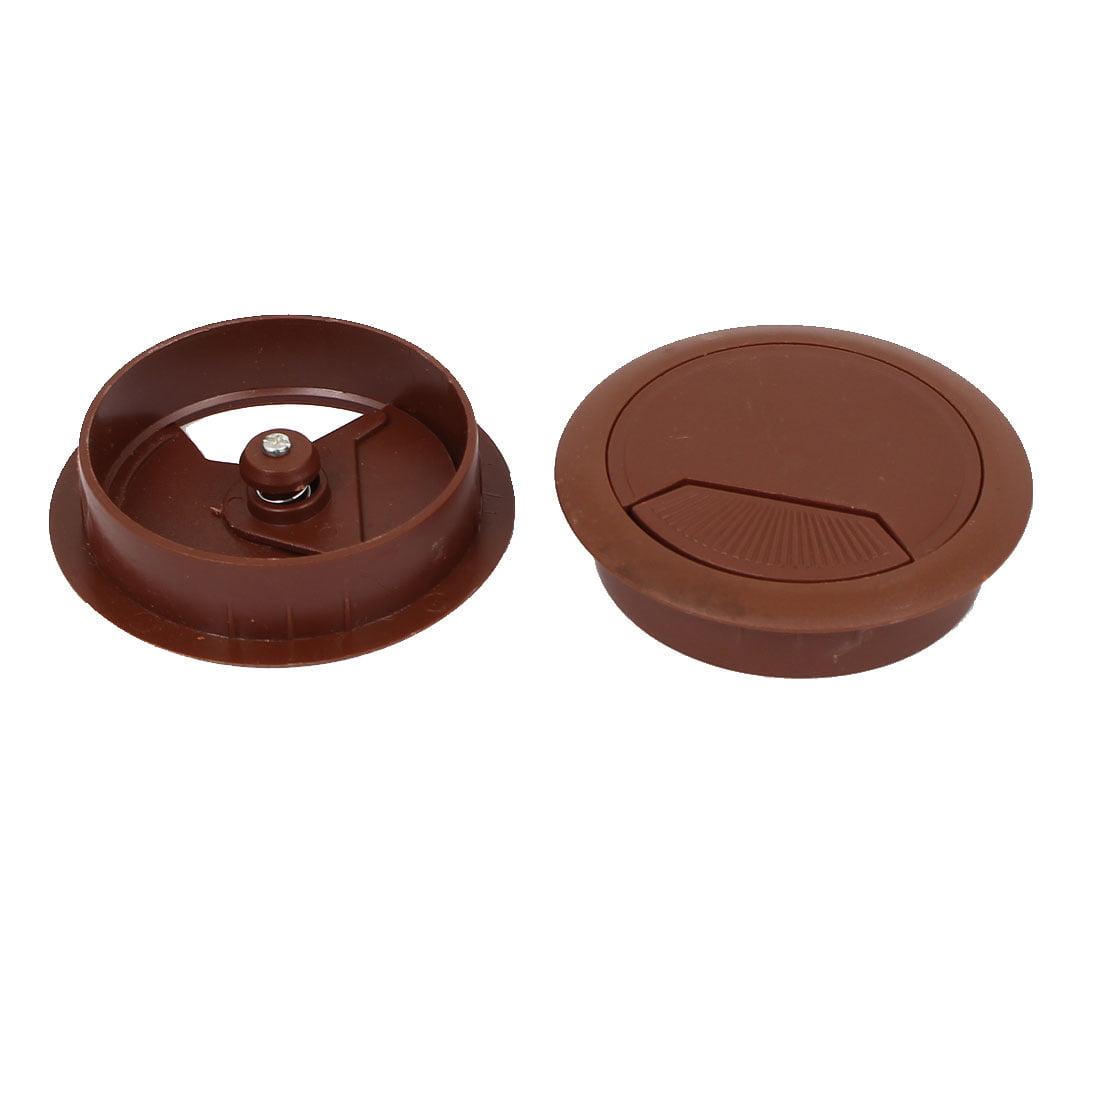 4 Pcs Office Computer Desk Plastic Cable Hole Cover Grommets Brown 60mm Diameter - image 2 of 3